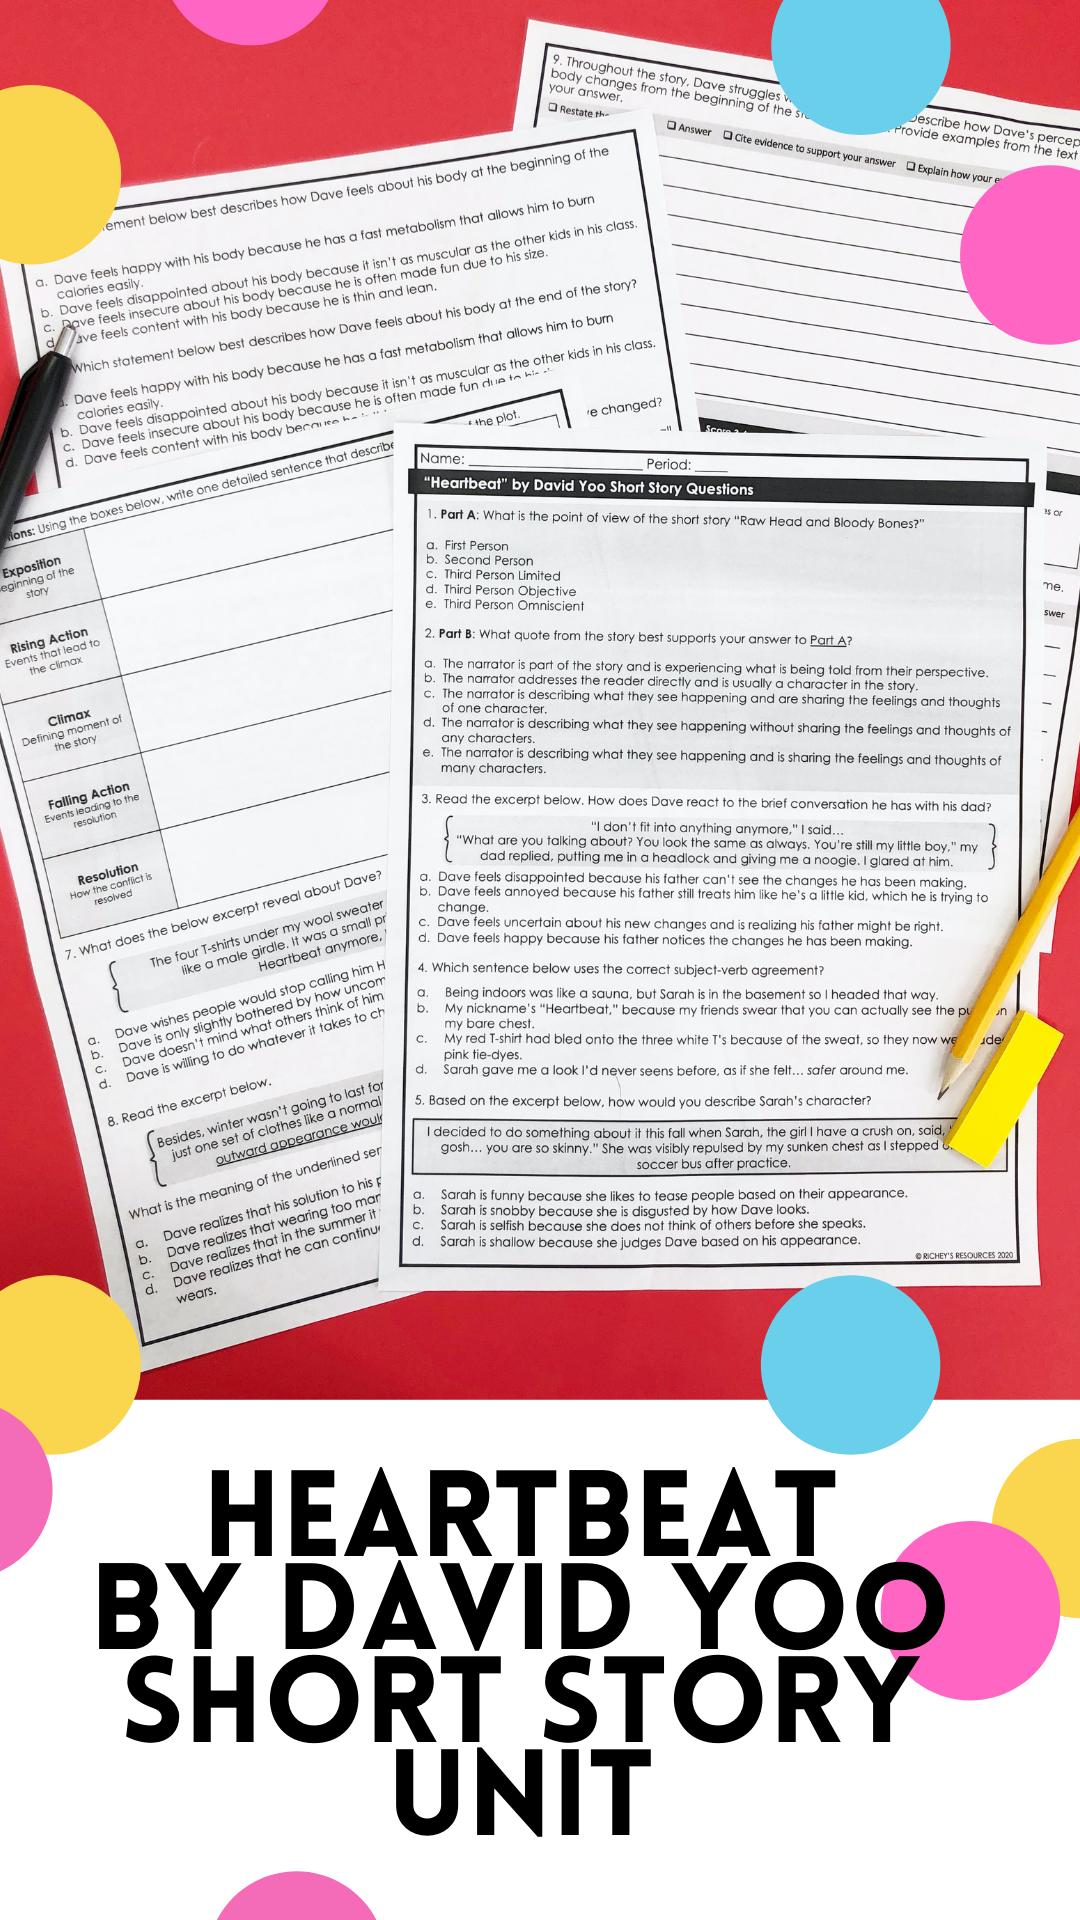 Hmh 7 Heartbeat Short Story Writing Response Informative Essay Short Story Unit [ 1920 x 1080 Pixel ]